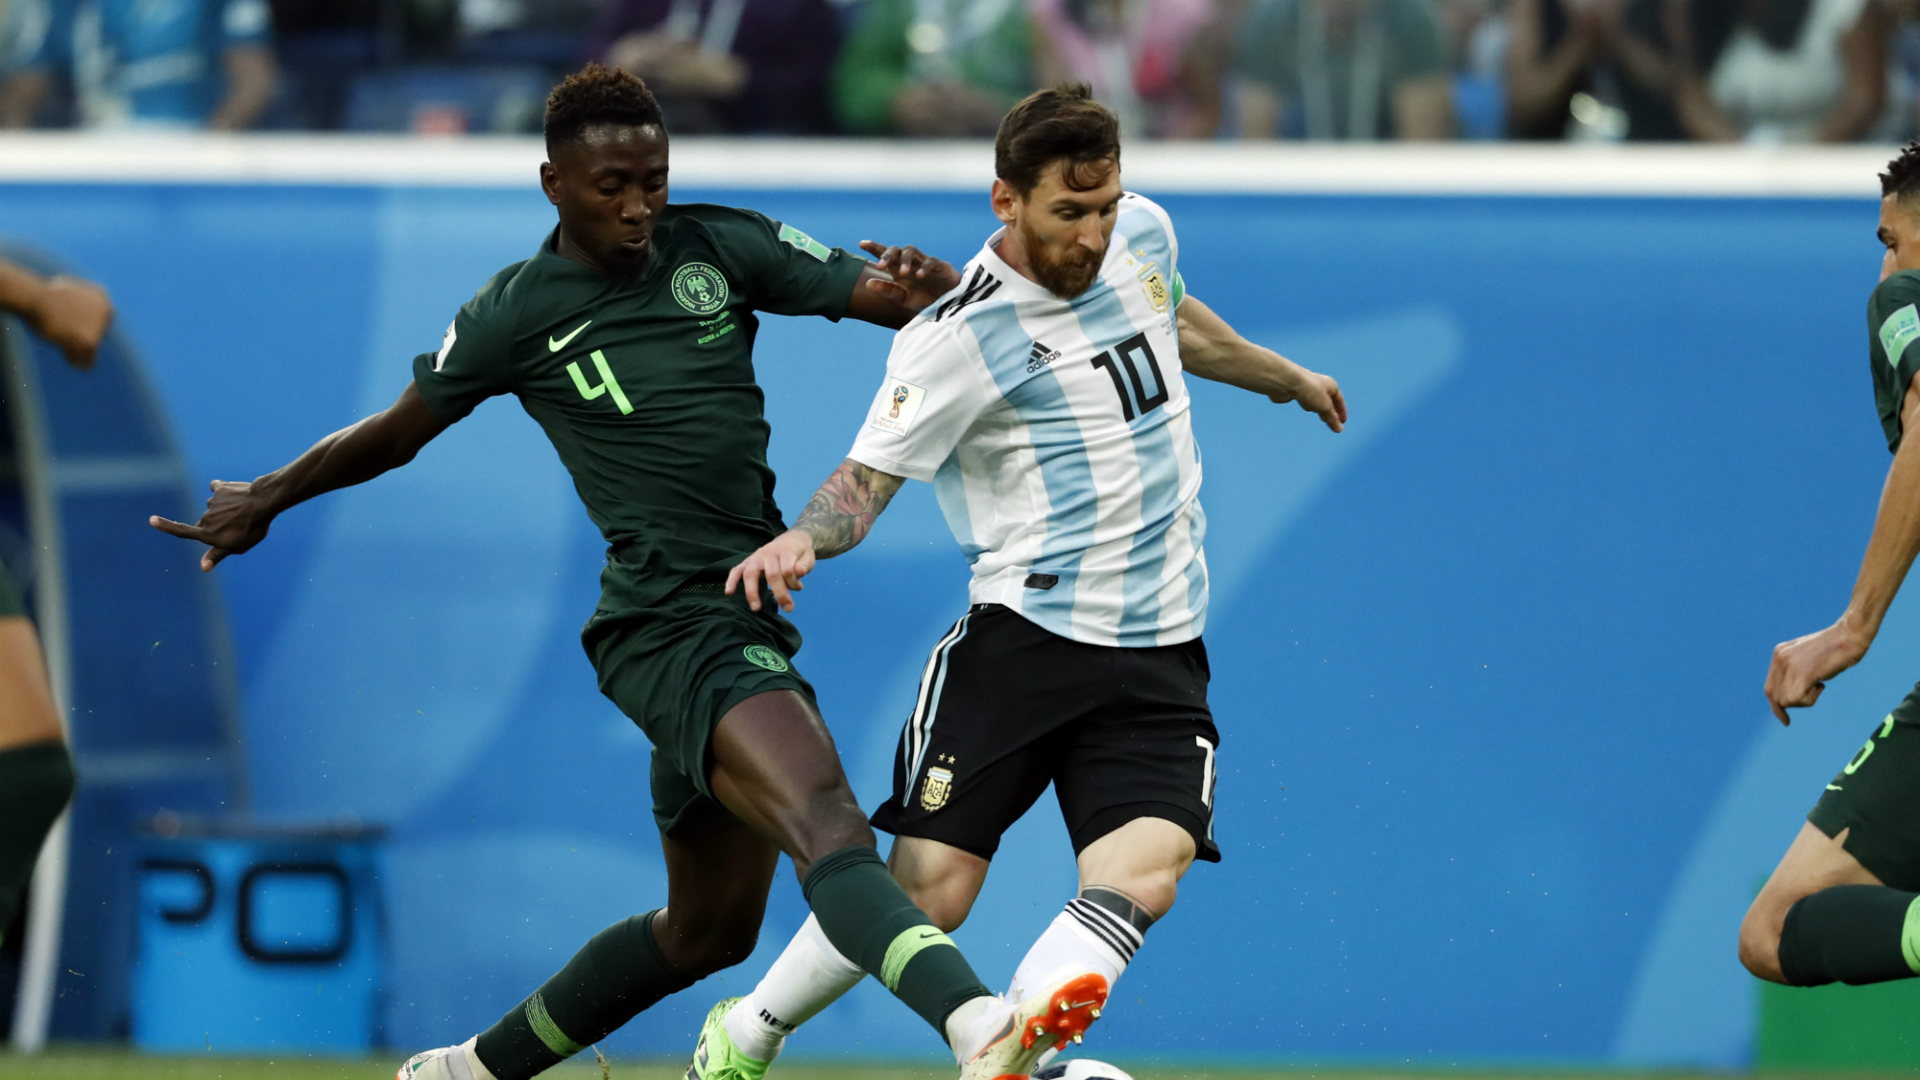 Nigeria v. Argentina - Ndidi